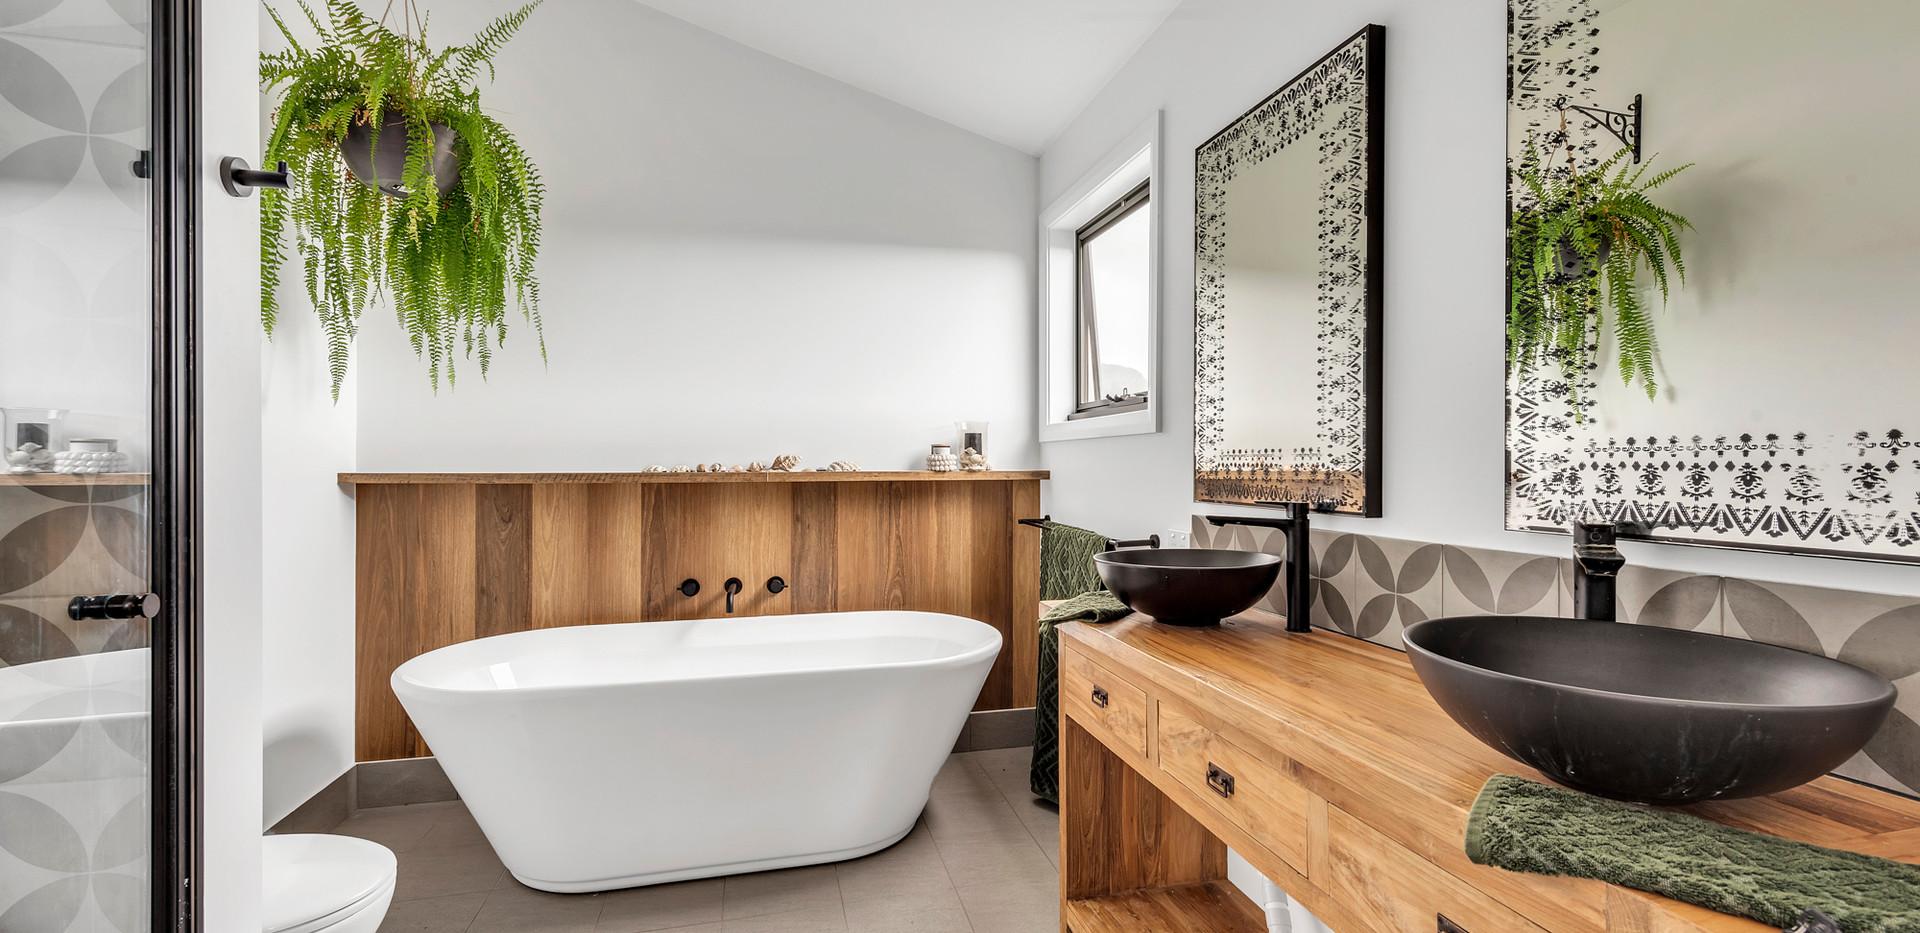 Professional Bathroom Photography